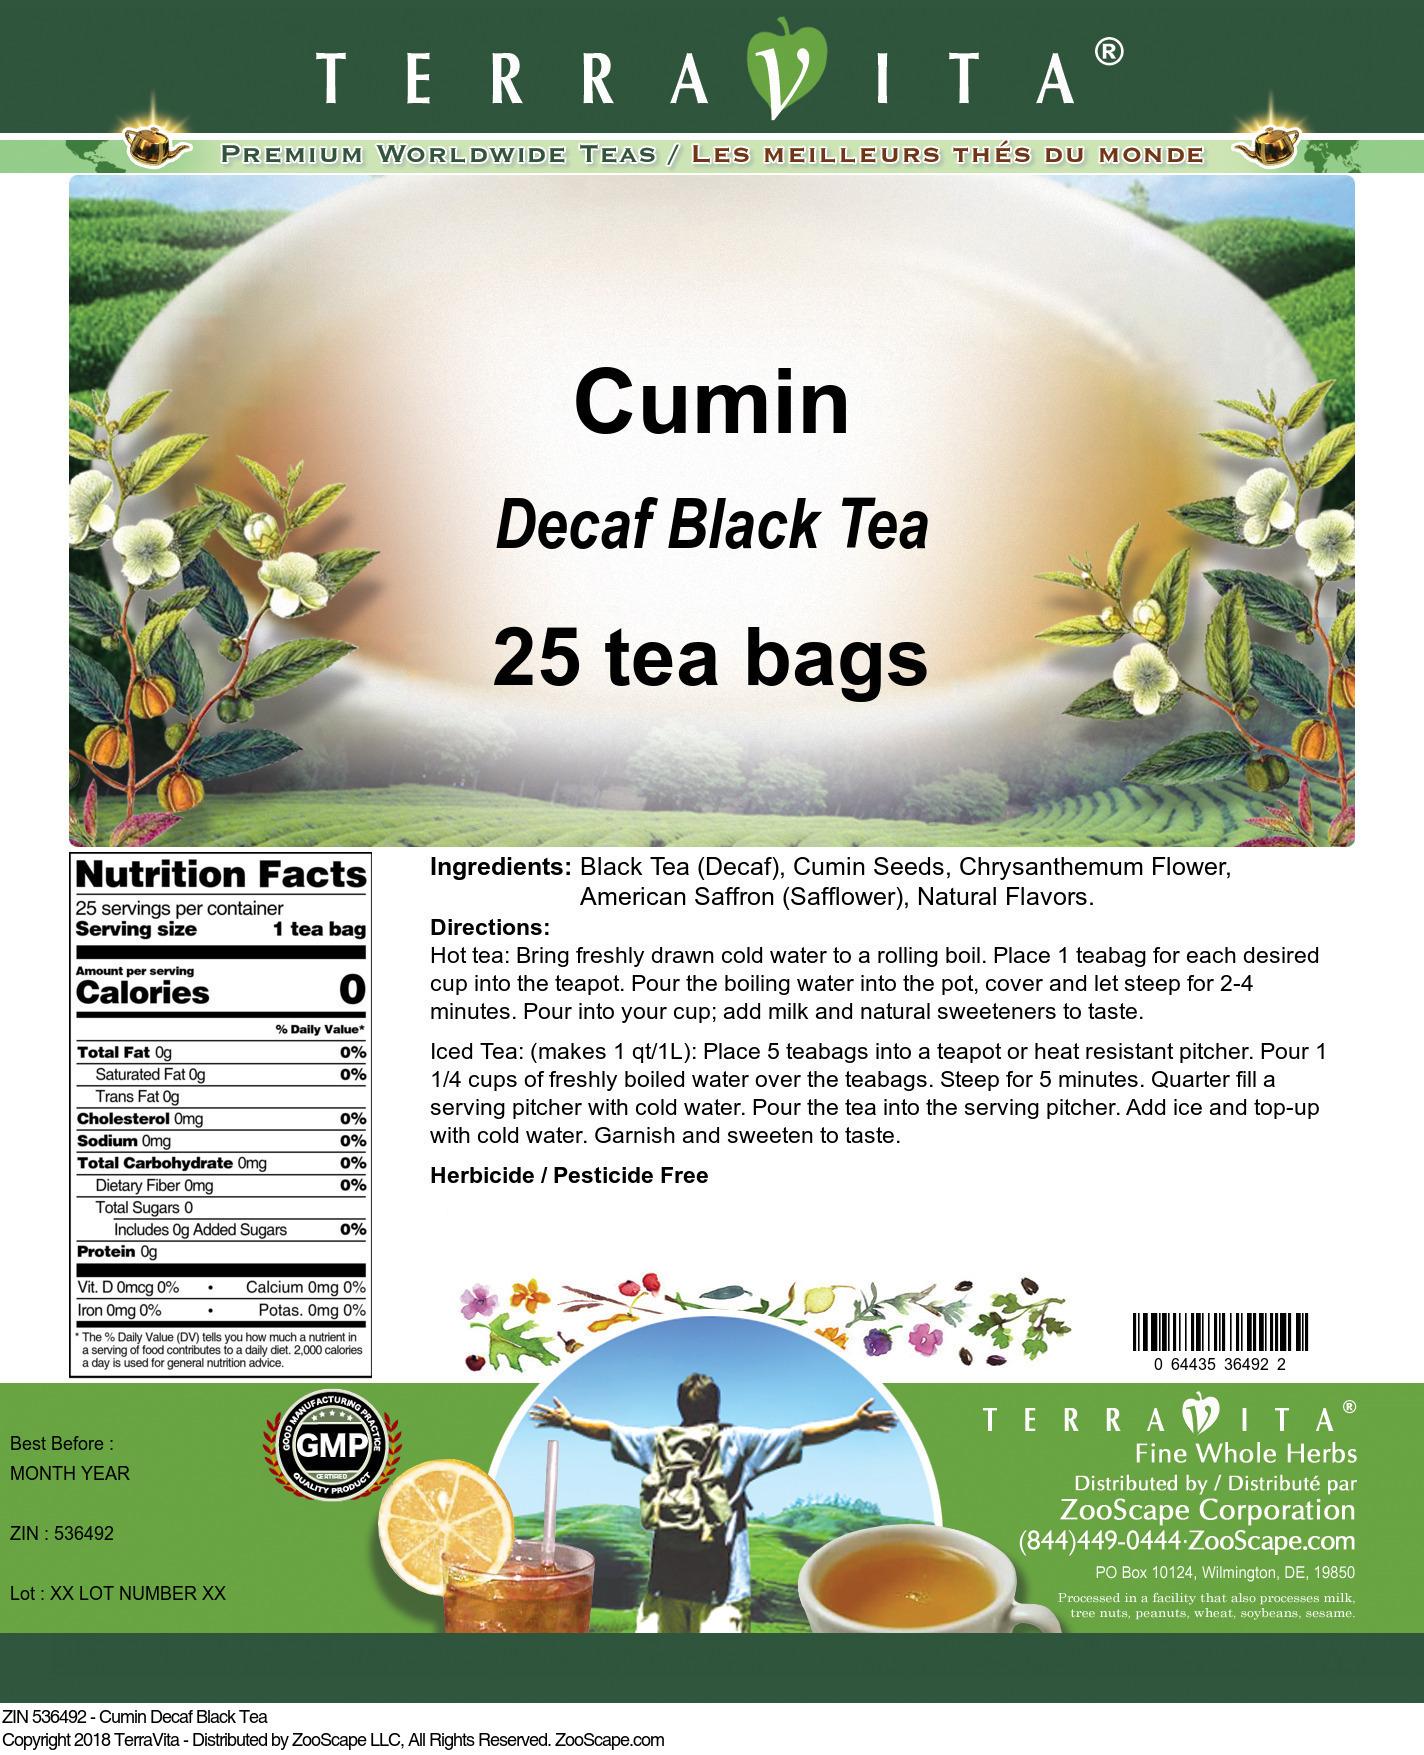 Cumin Decaf Black Tea